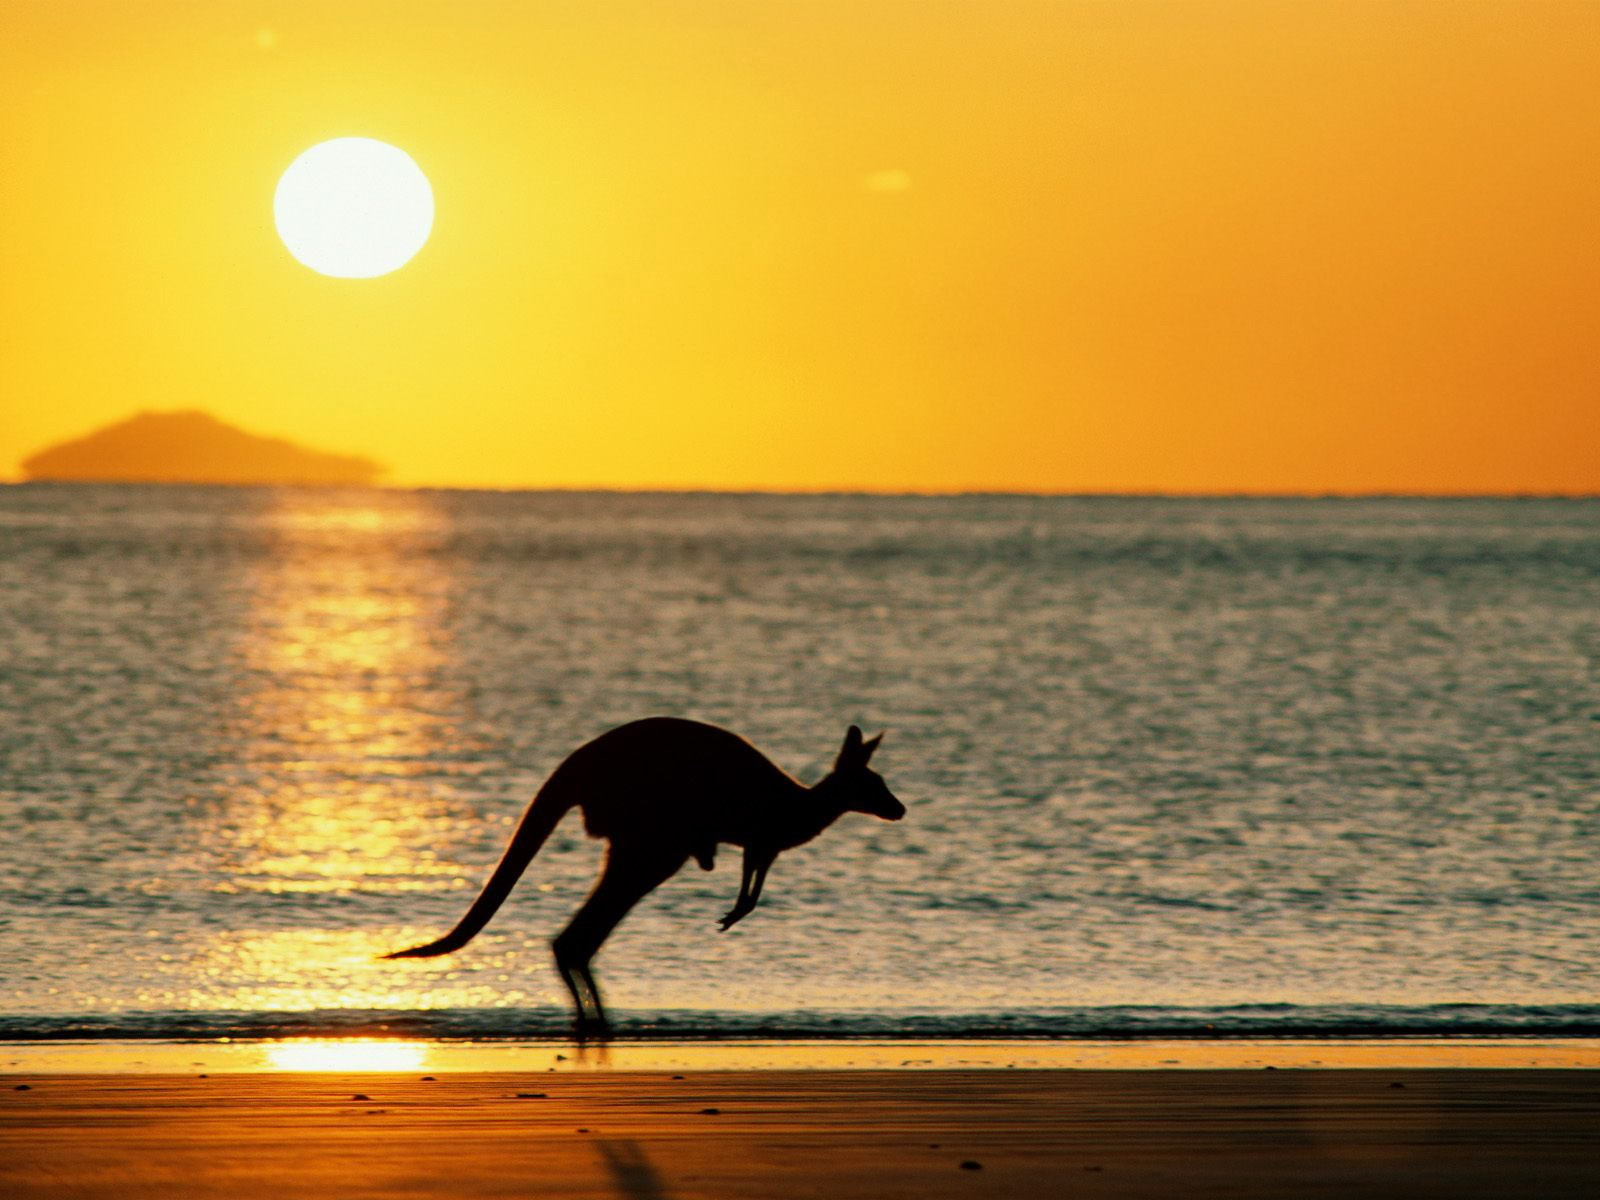 kangaroo runing Kangaroo Island AUSTRALIA www.tourismprofile.com